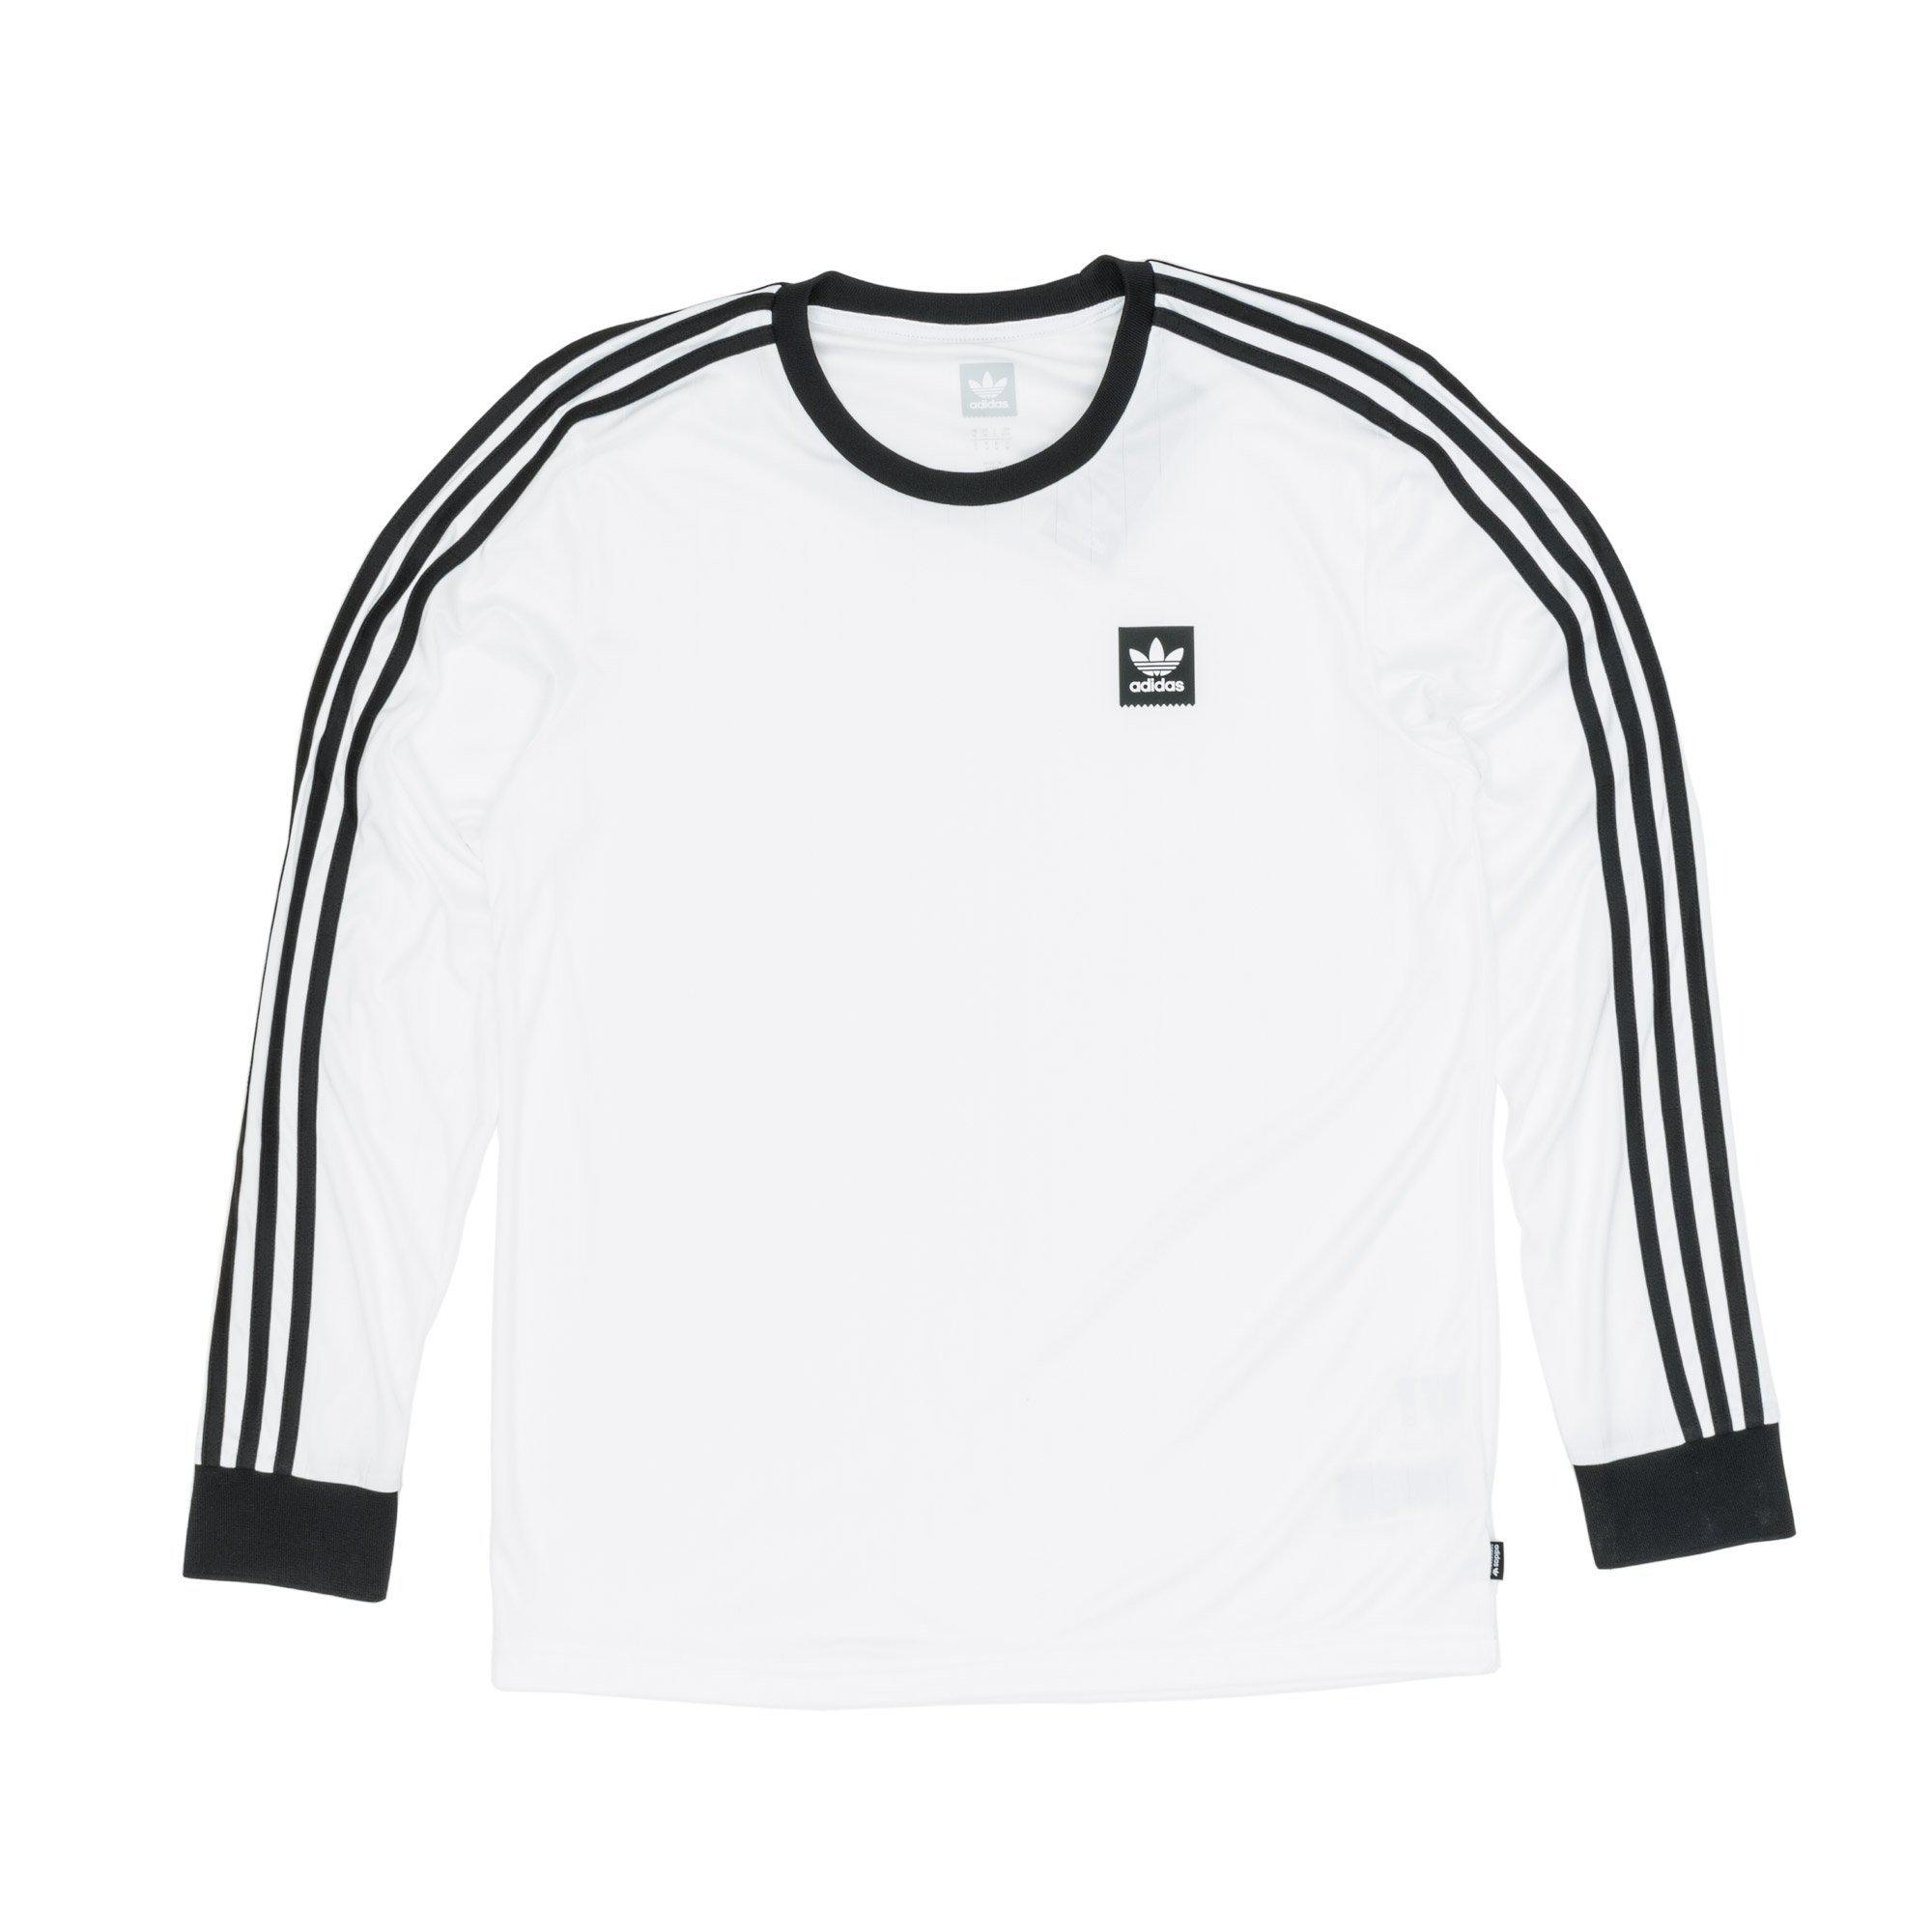 Adidas - White Club Jersey Longsleeve T-shirt for Men - Lyst. View  fullscreen 28b6af5b1